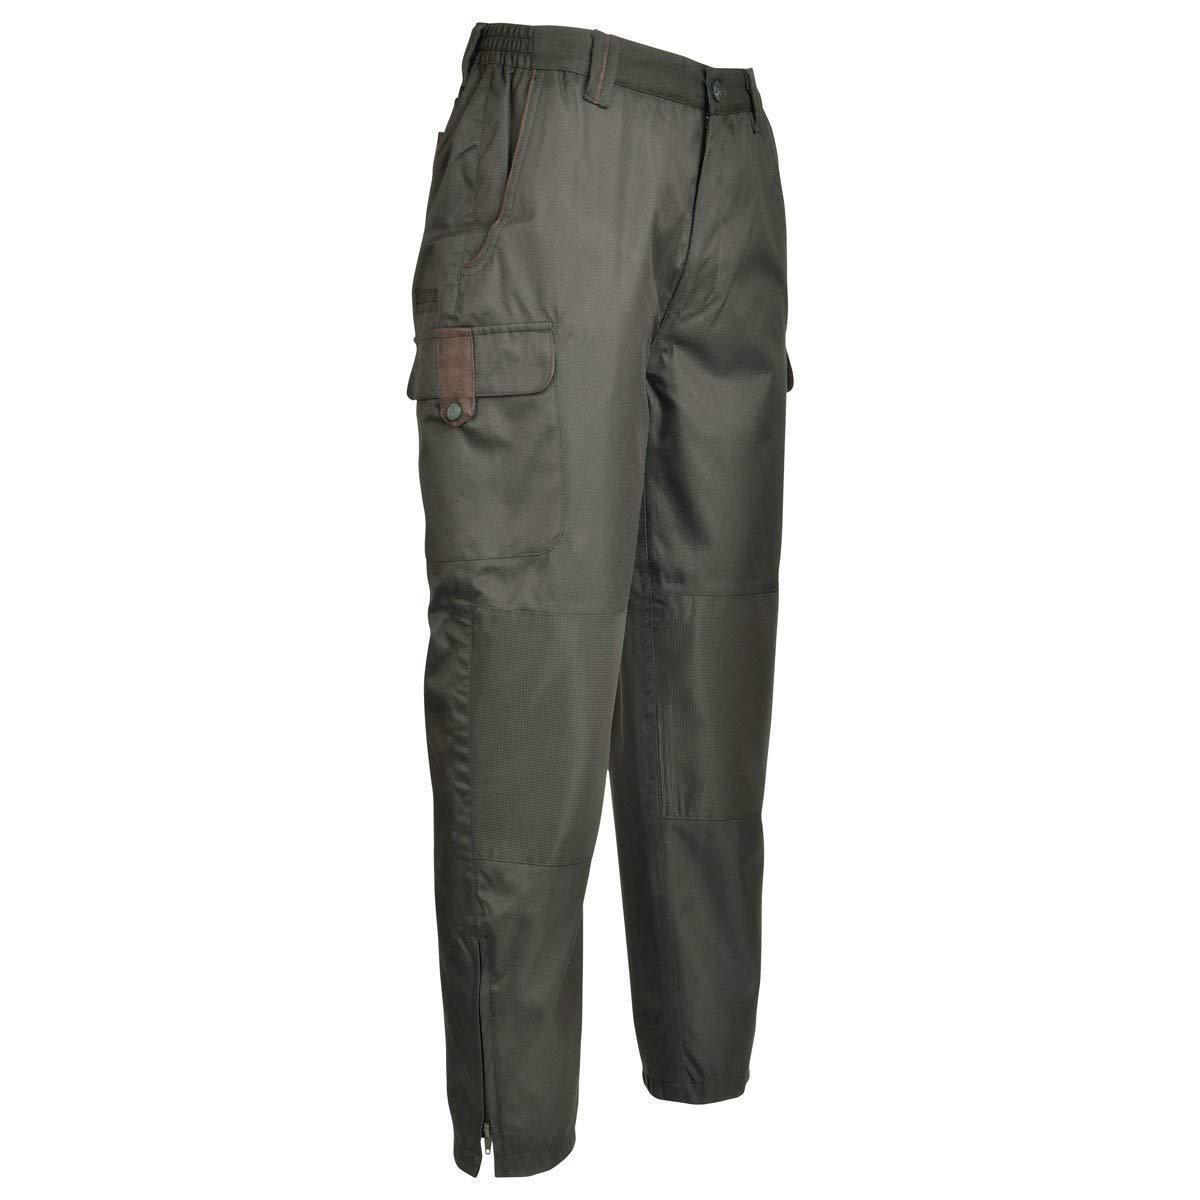 1029 Percussion Optimum Hunting Trousers Waterproof Olive Green Rip Stop Knee